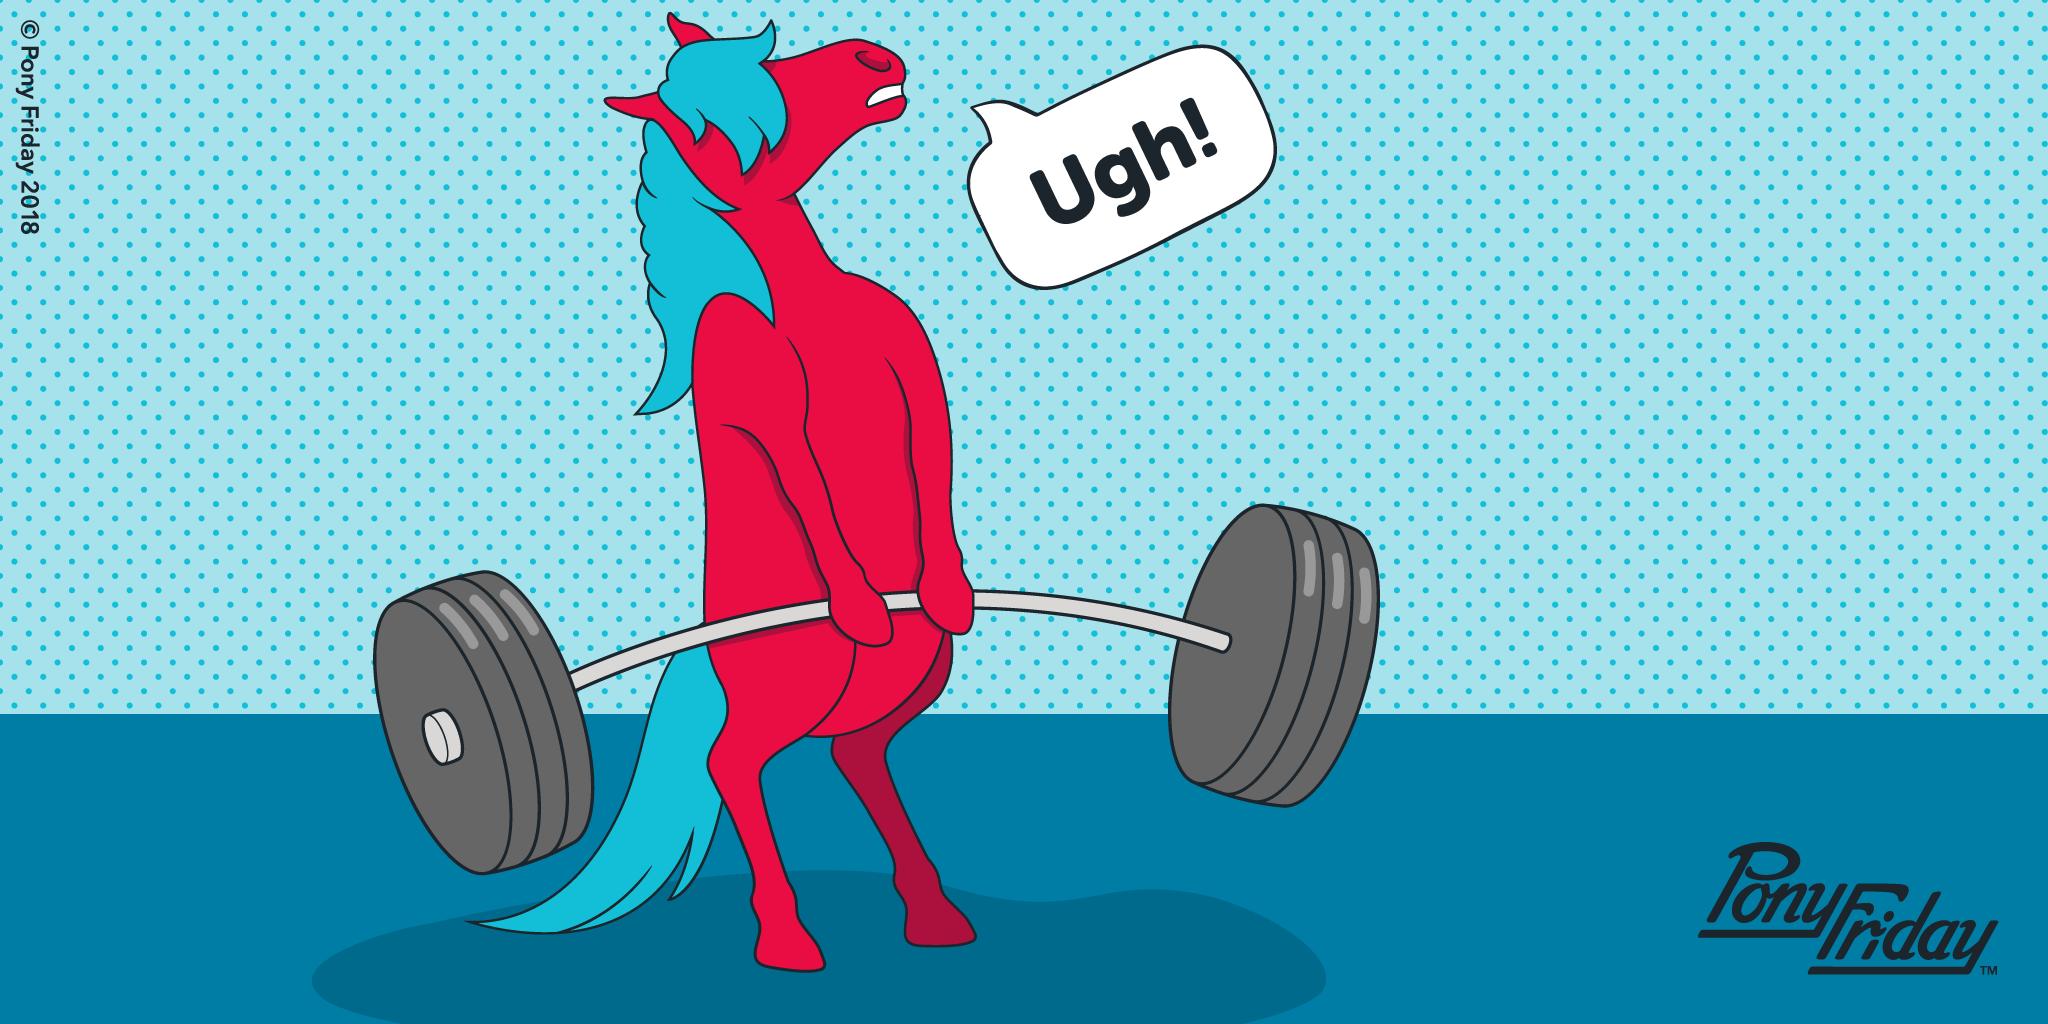 Pony-Friday-Struggle-weight-lifter-Blog-Post-Header-Image.png